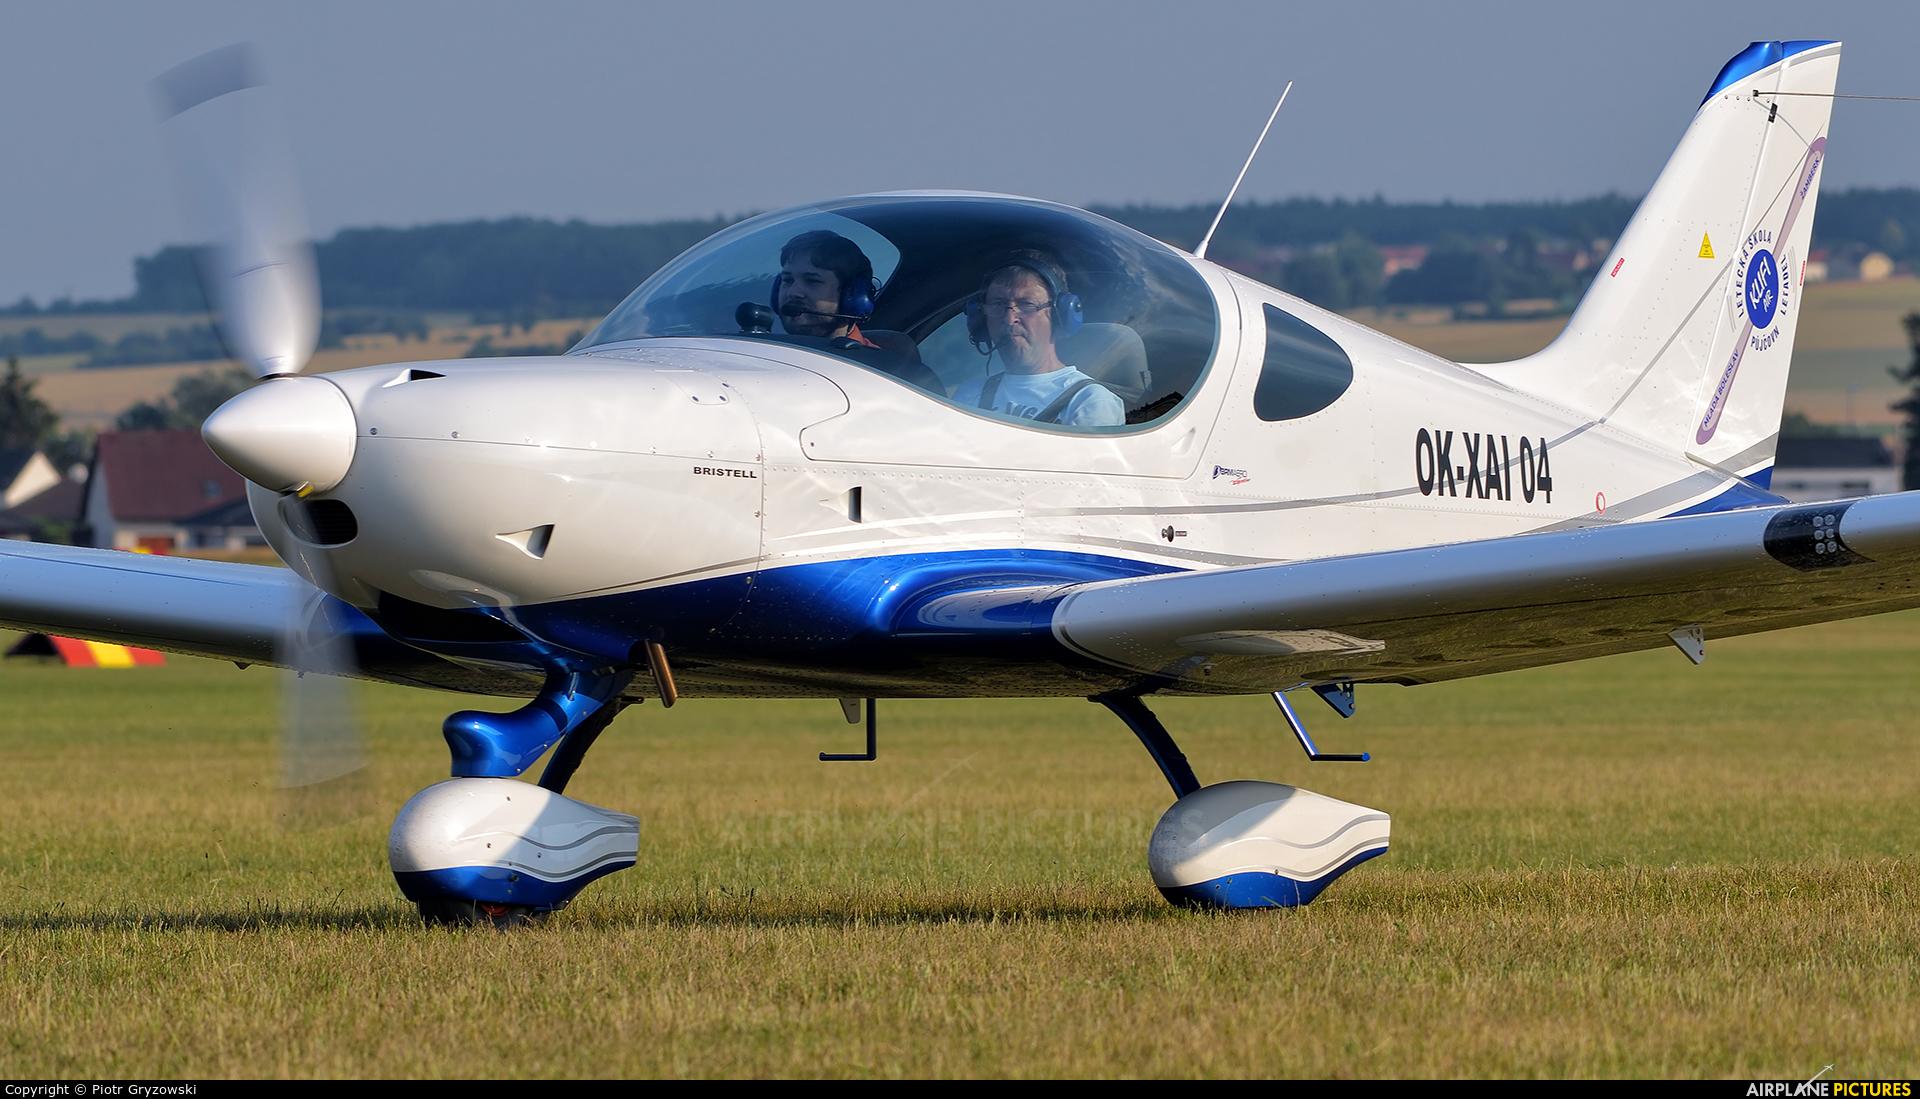 Private OK-XAI 04 aircraft at Mladá Boleslav